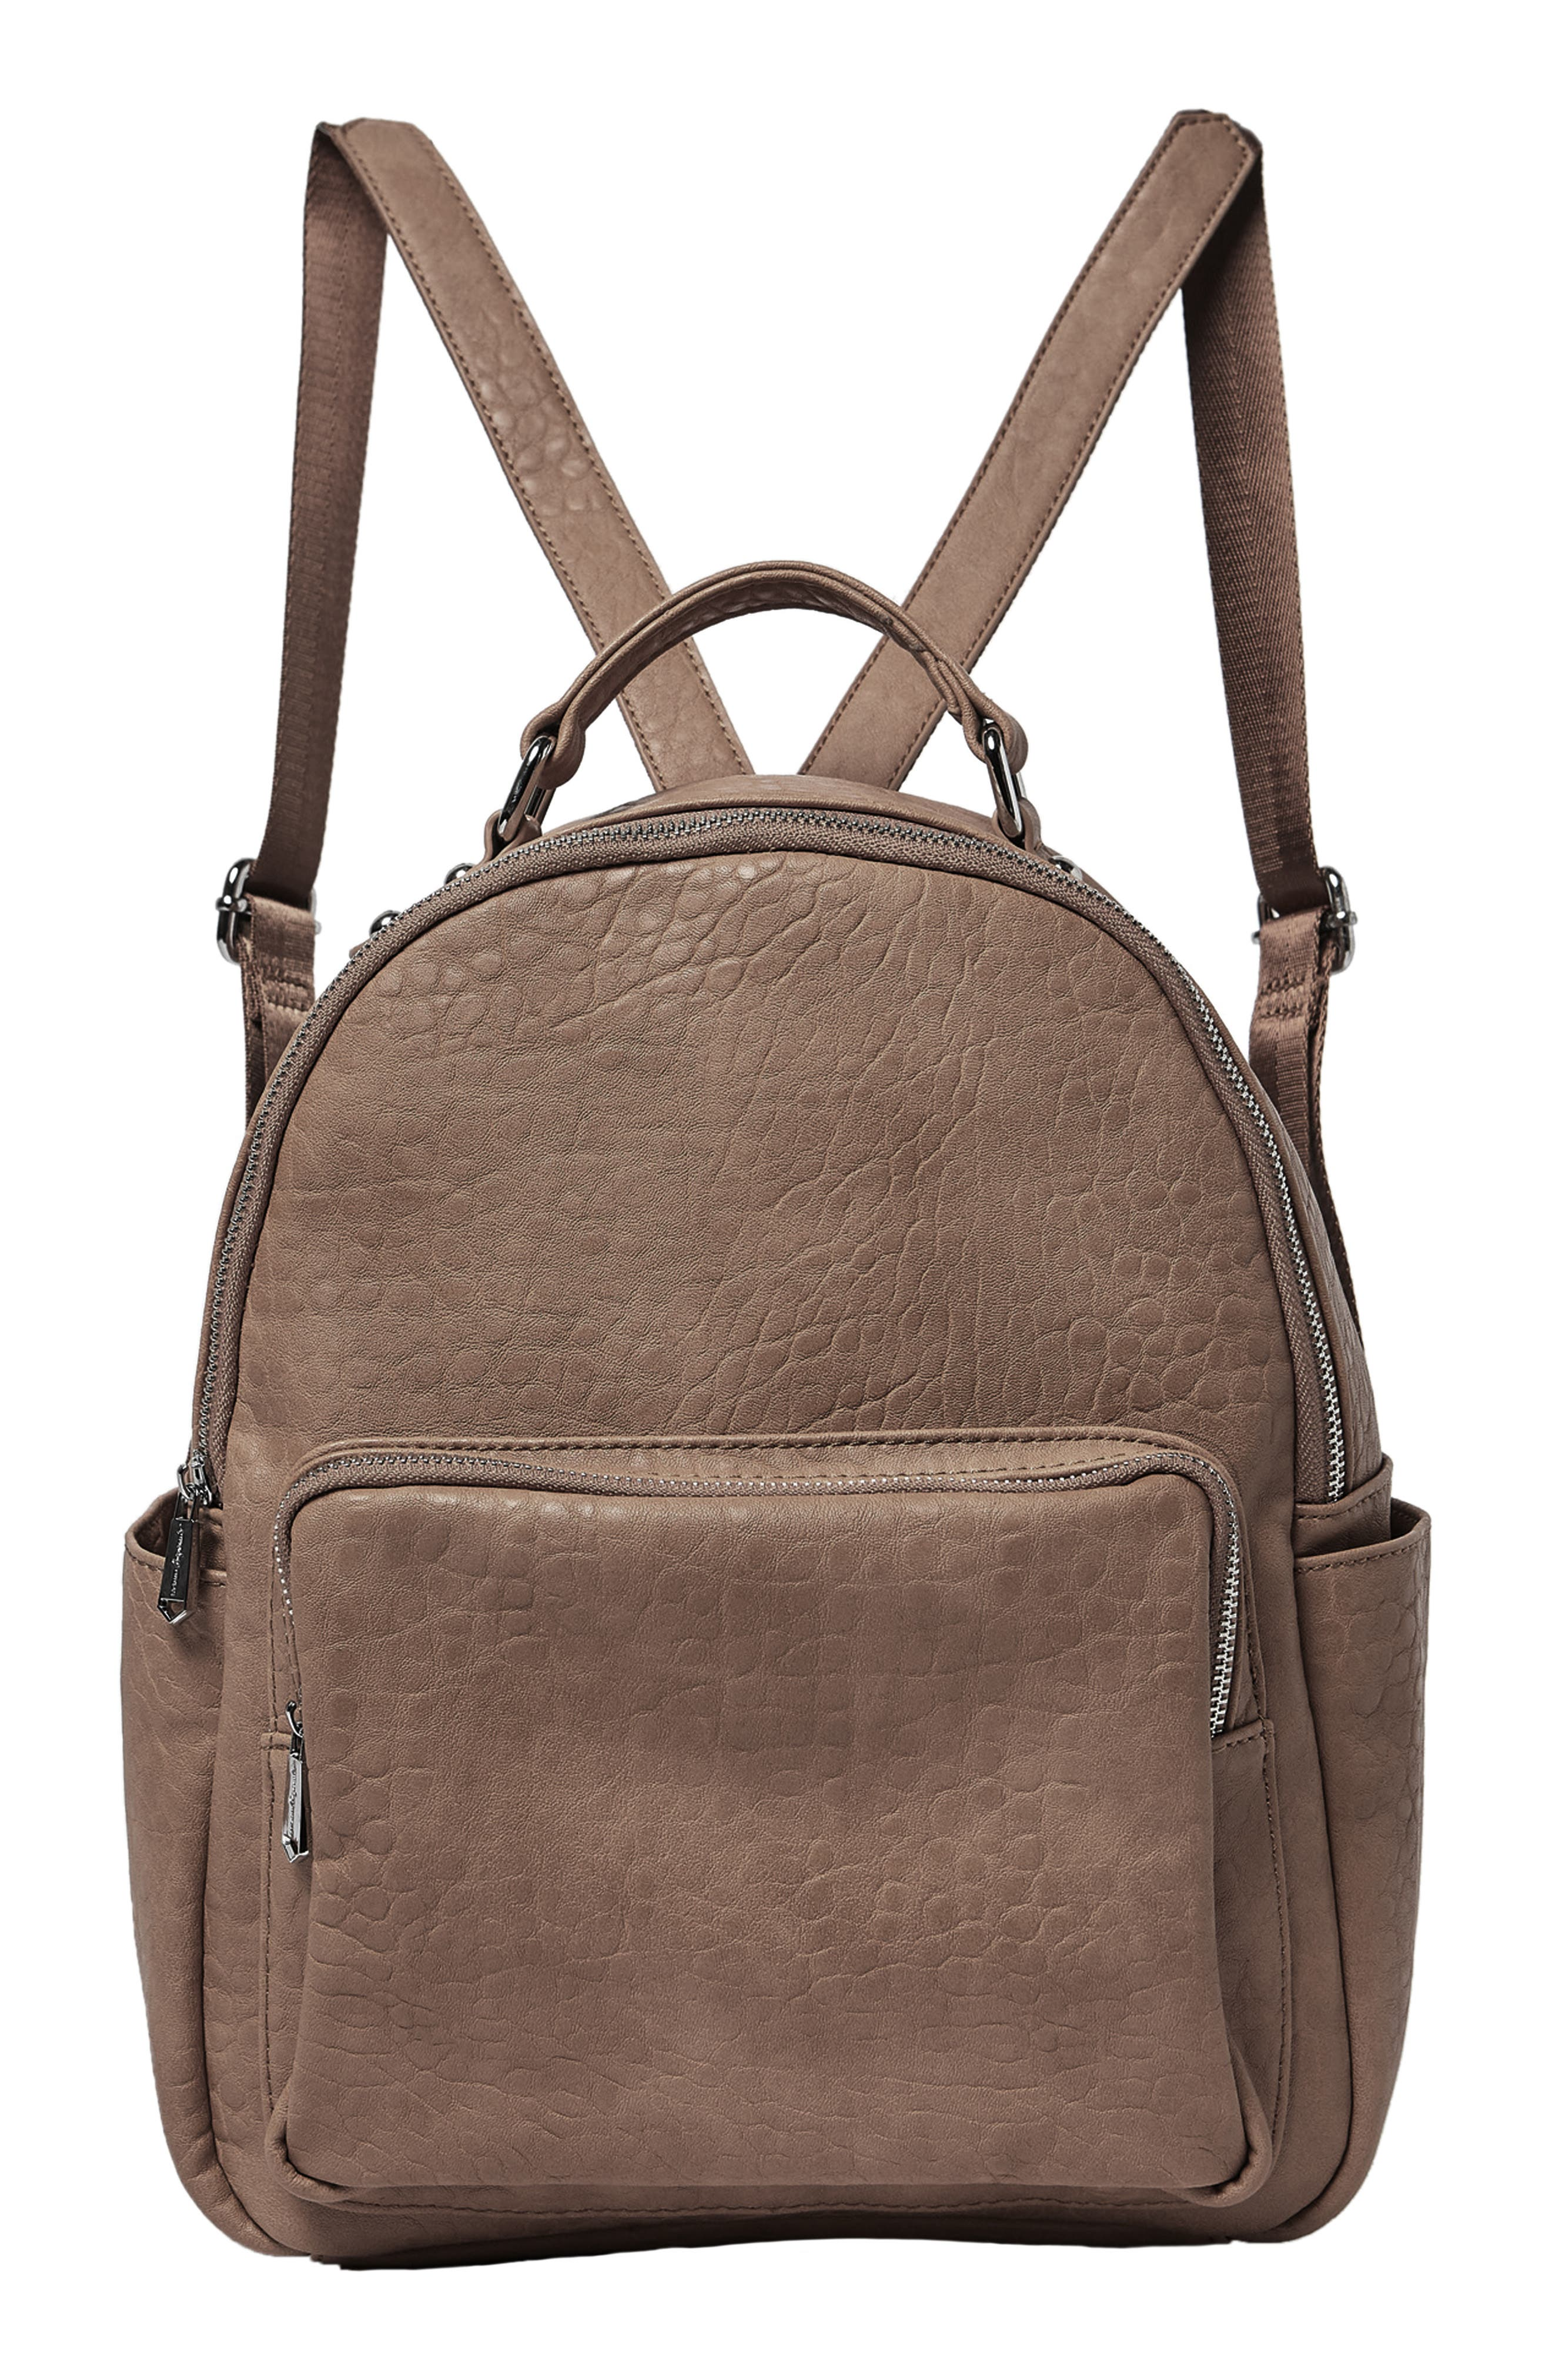 South Bag Vegan Leather Backpack,                             Main thumbnail 1, color,                             MOCHA